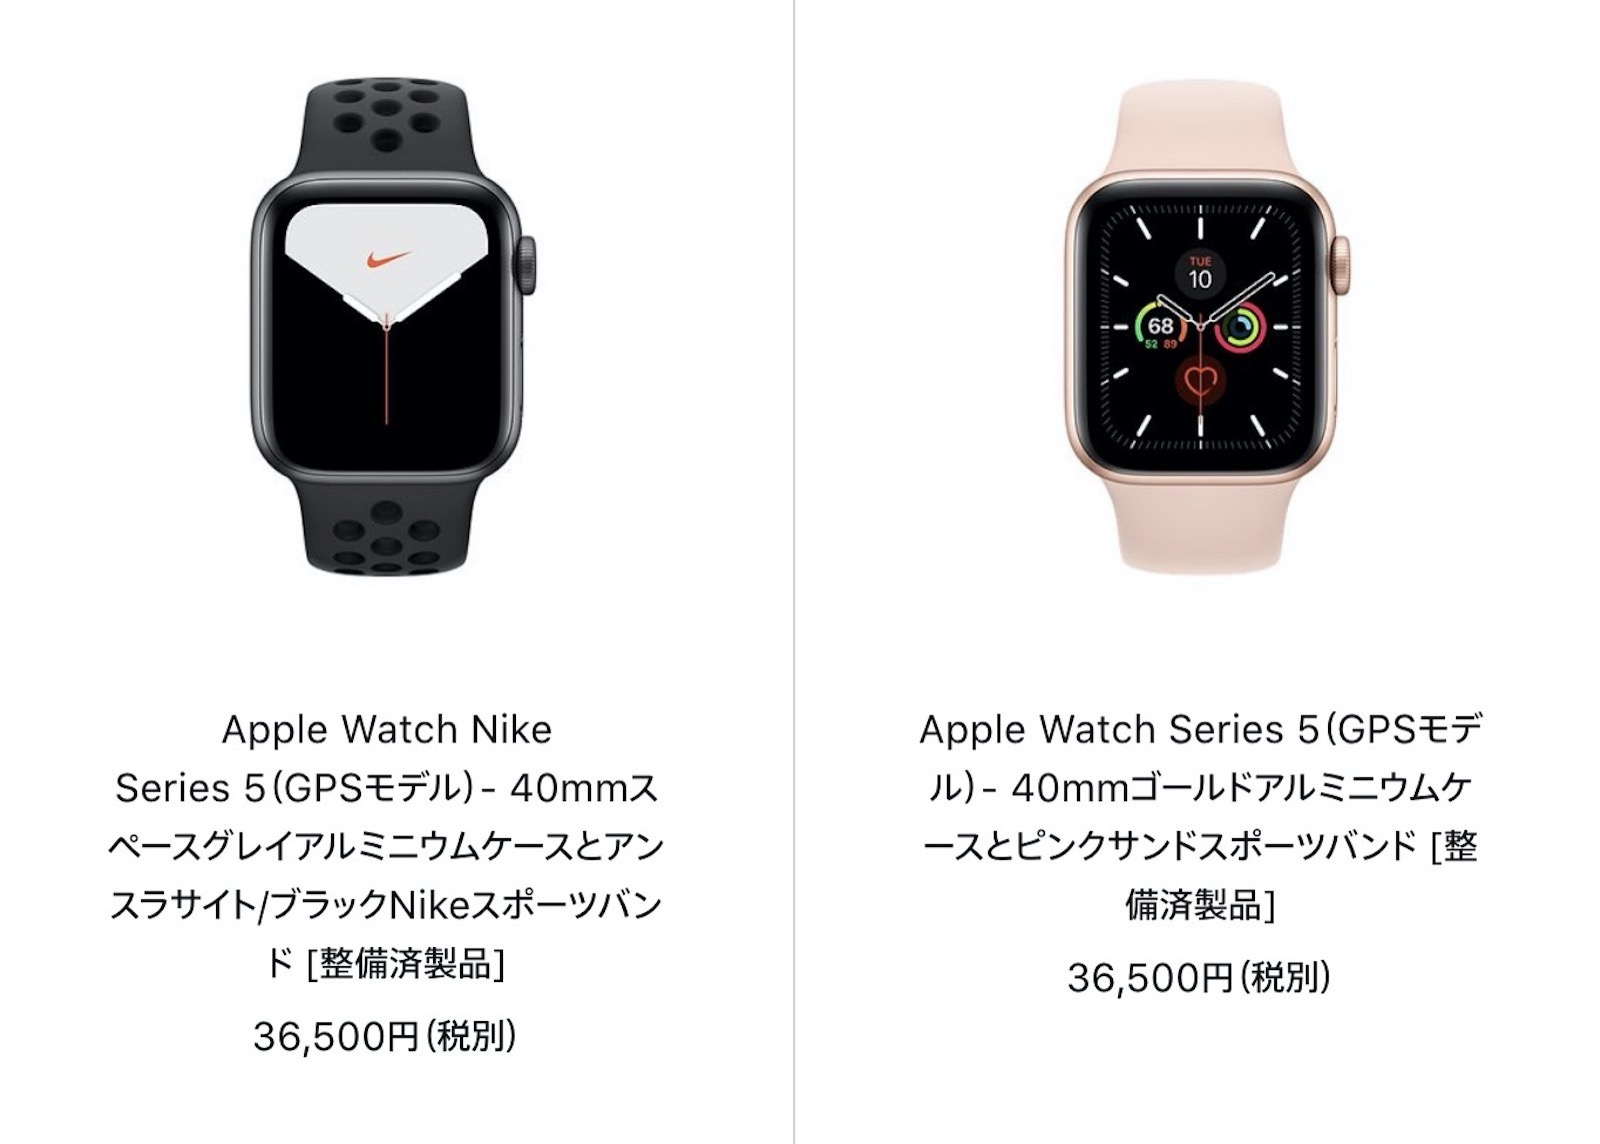 Applewatch series5 refurbished 20200630